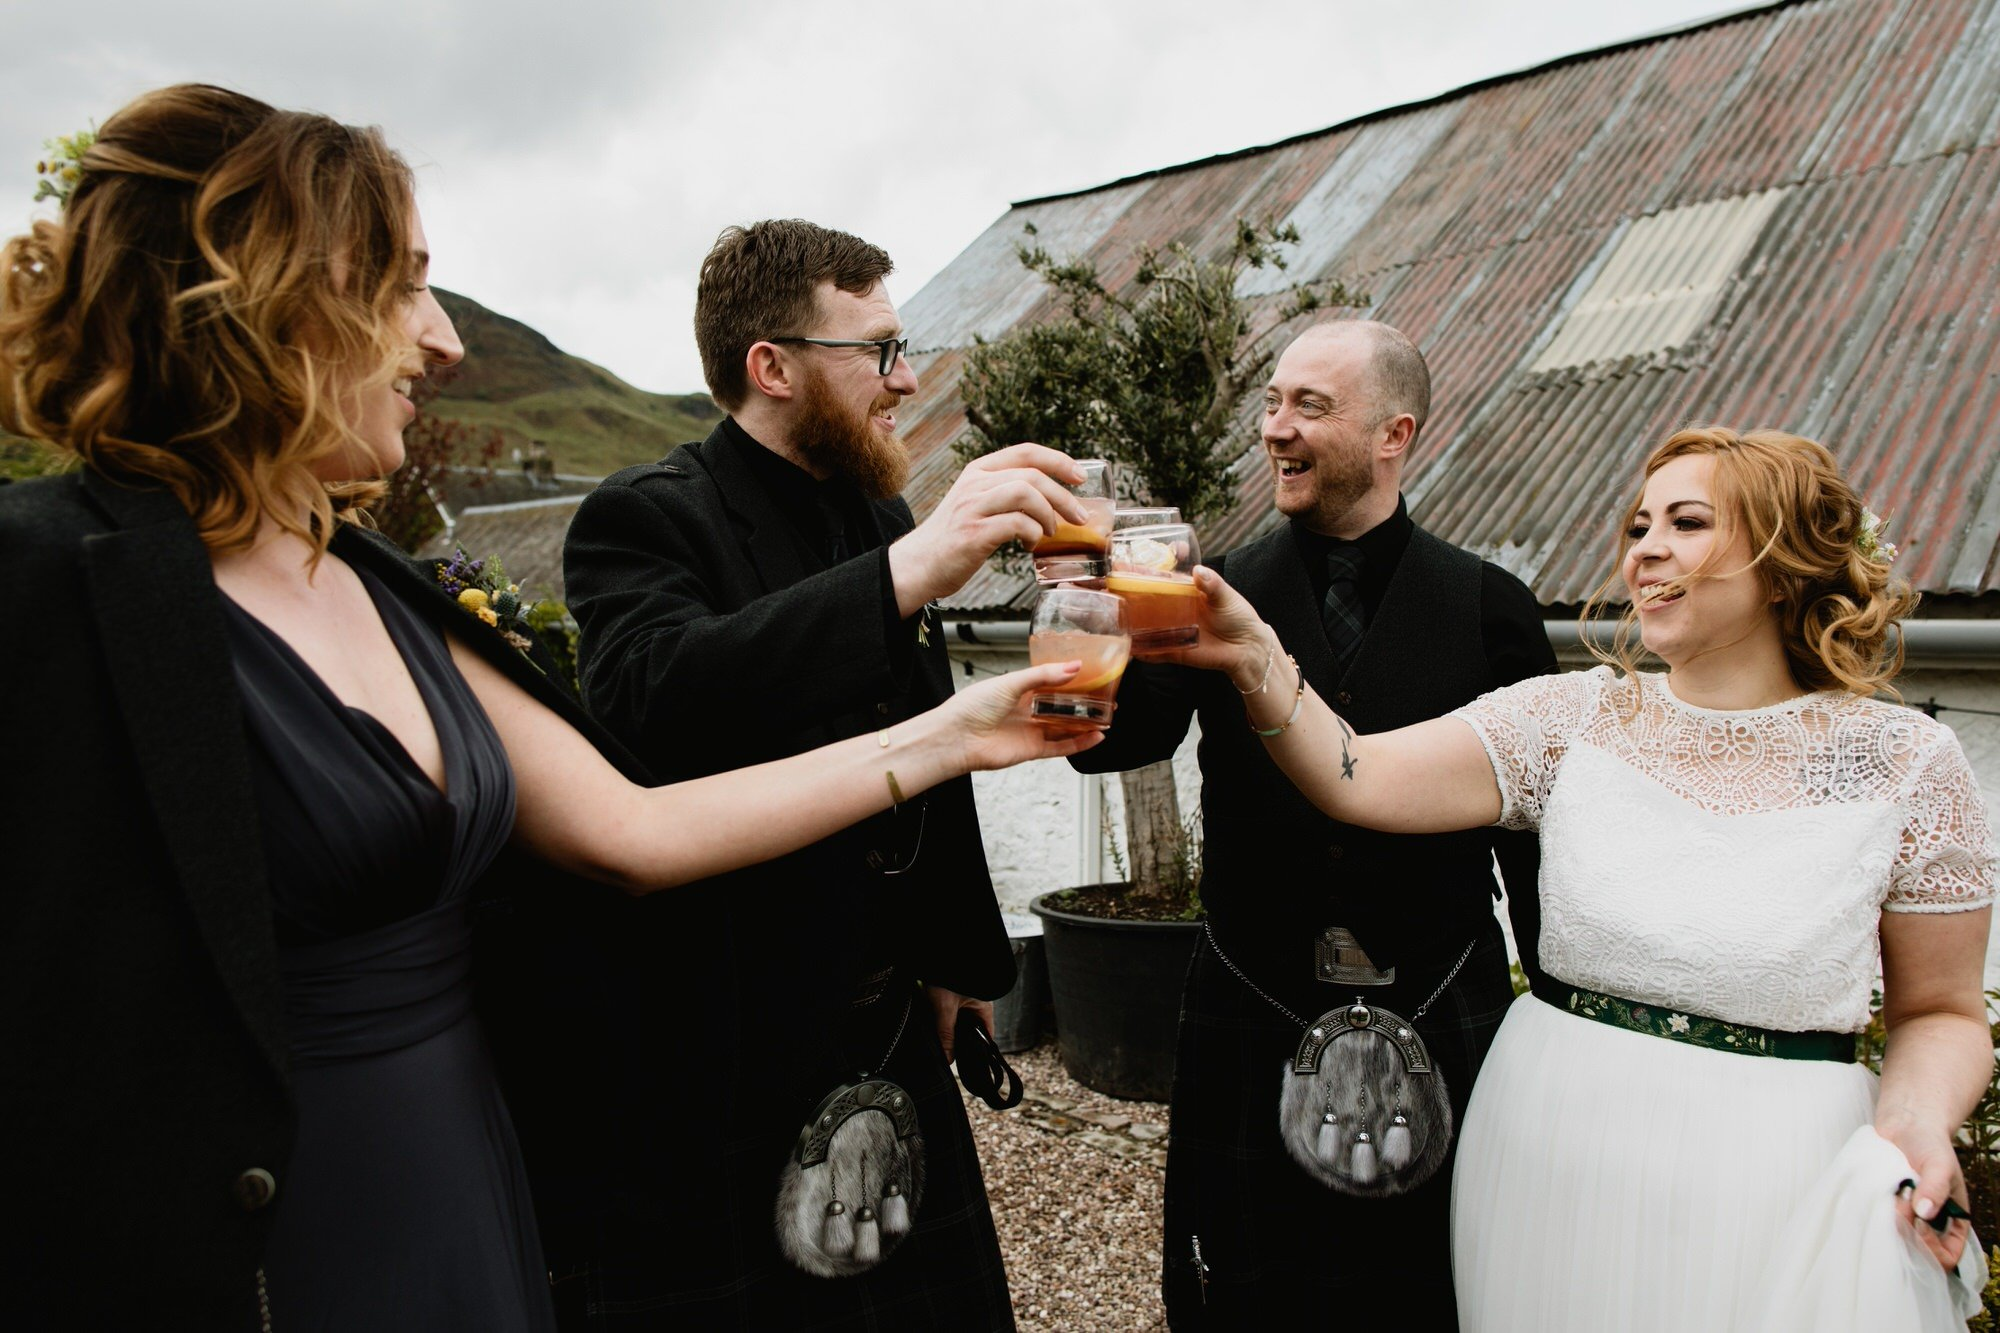 034 TIN SHED KNOCKRAICH WEDDING AUSTRIAN SCOTTISH ZOE ALEXANDRA PHOTOGRAPHY